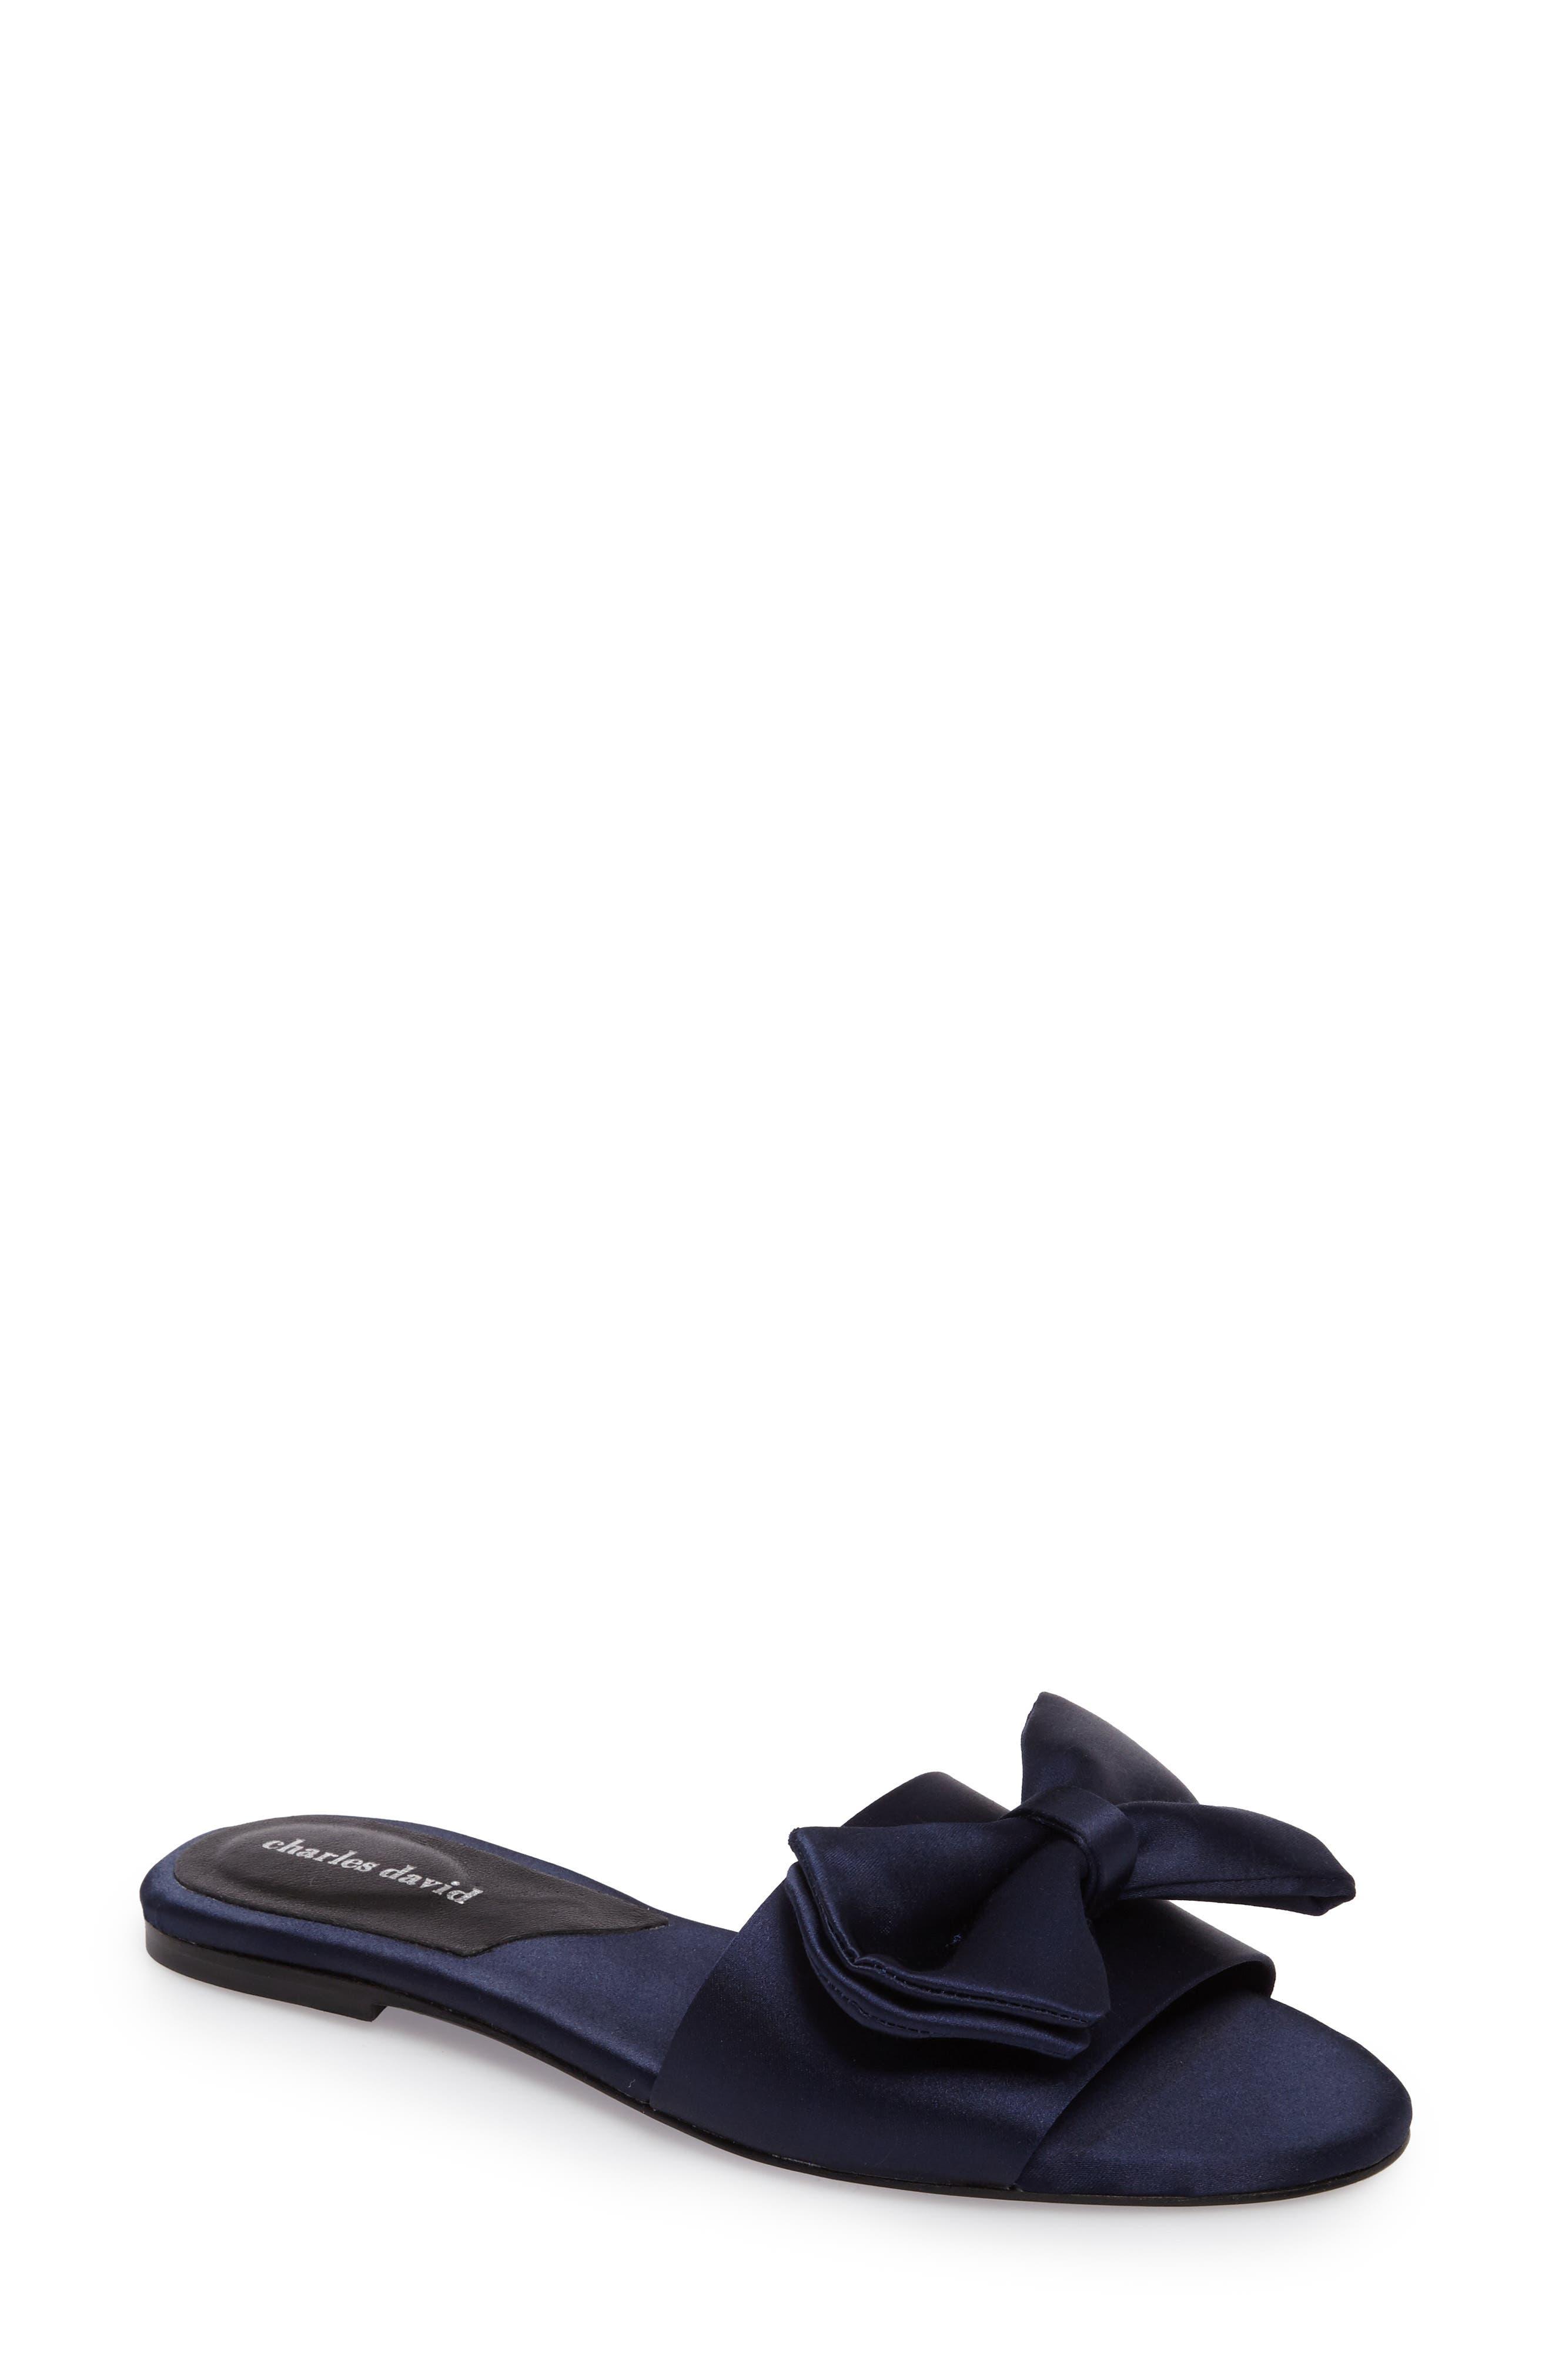 Bow Slide Sandal,                             Main thumbnail 1, color,                             NAVY SATIN